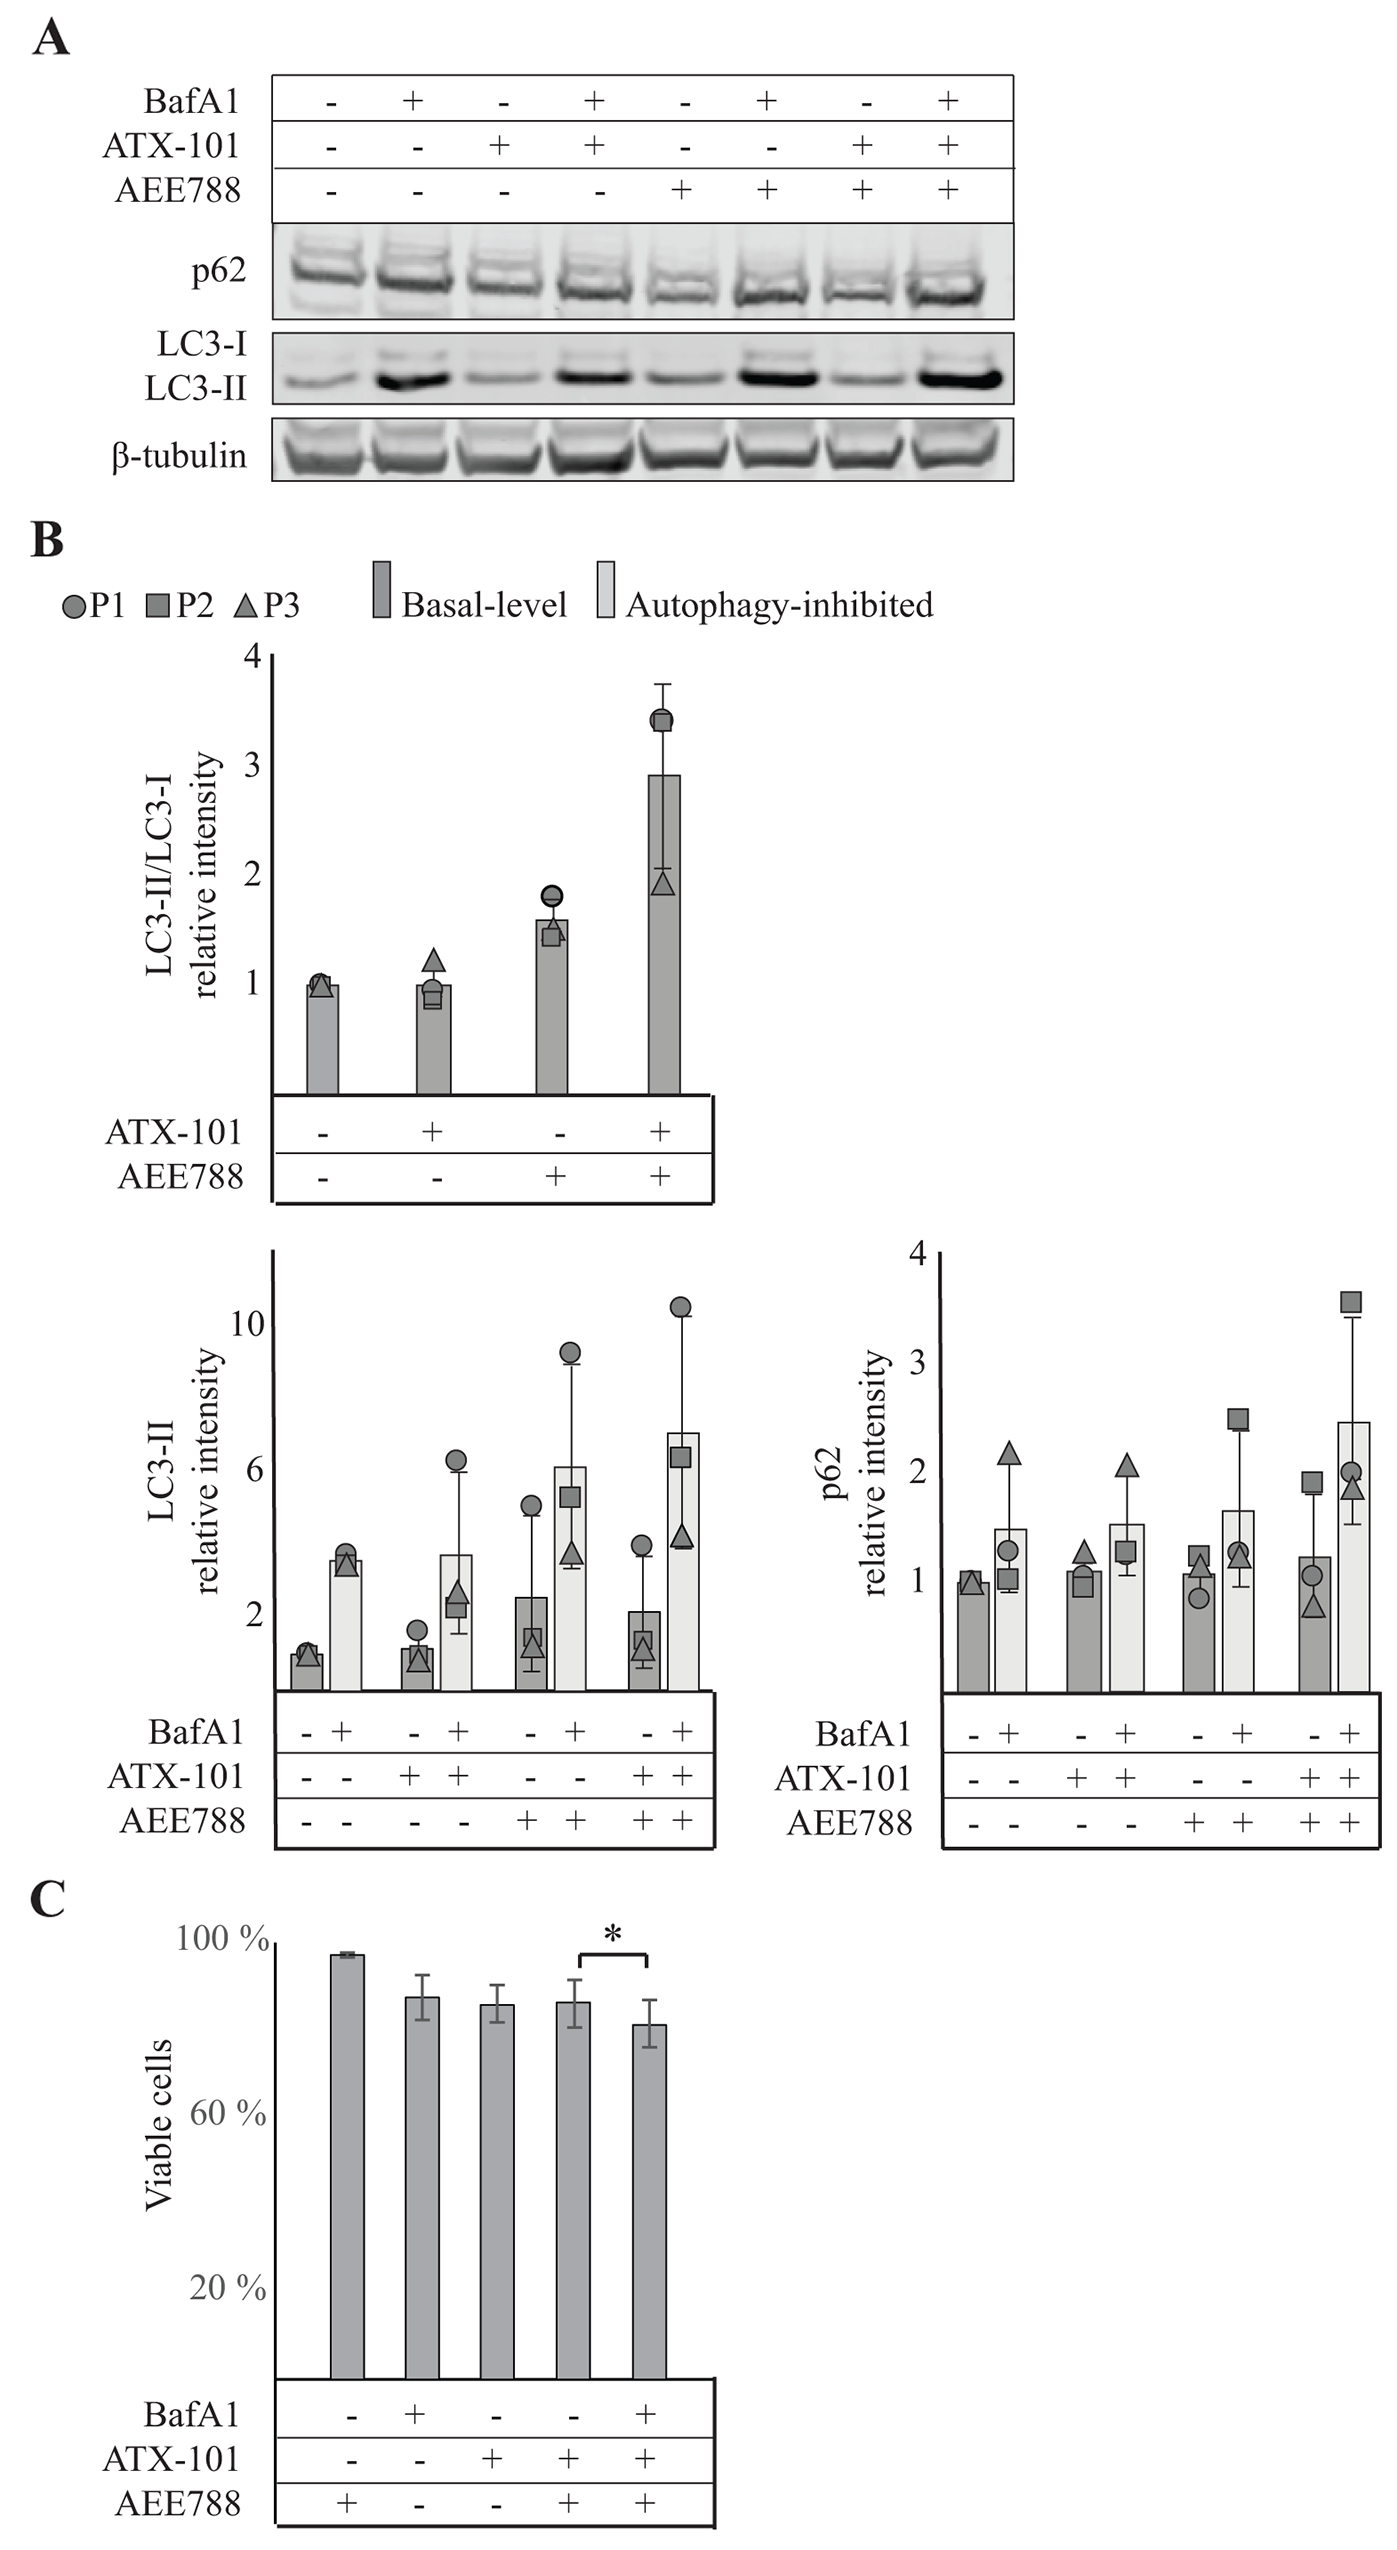 Combining ATX-101 with AEE788 treatment enhances autophagy.